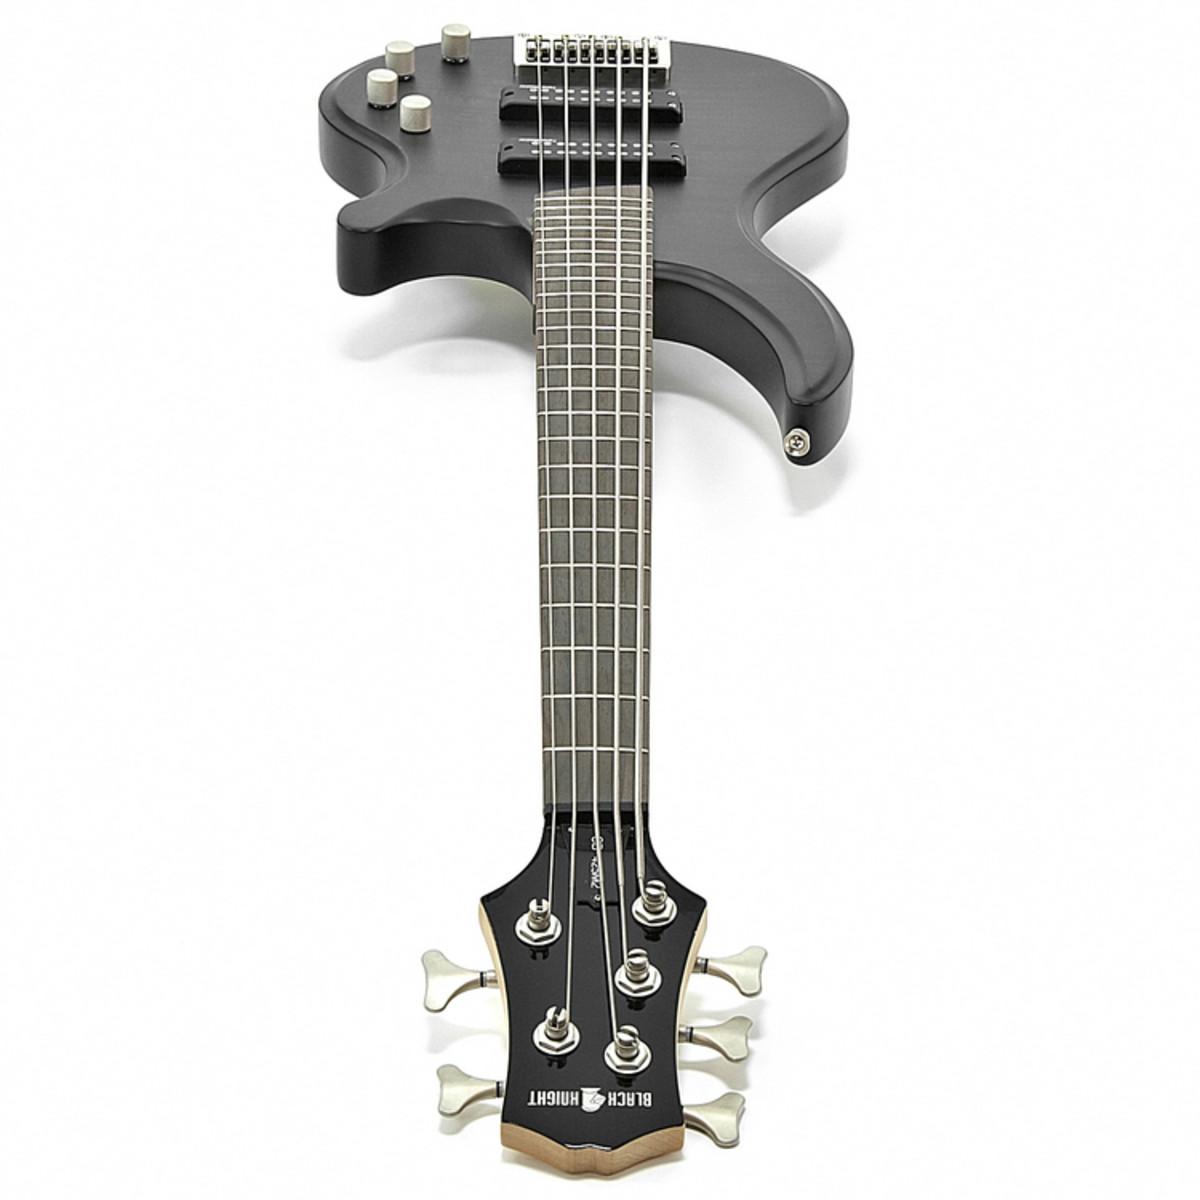 black knight cb 12 5 string bass guitar black satin at gear4music. Black Bedroom Furniture Sets. Home Design Ideas